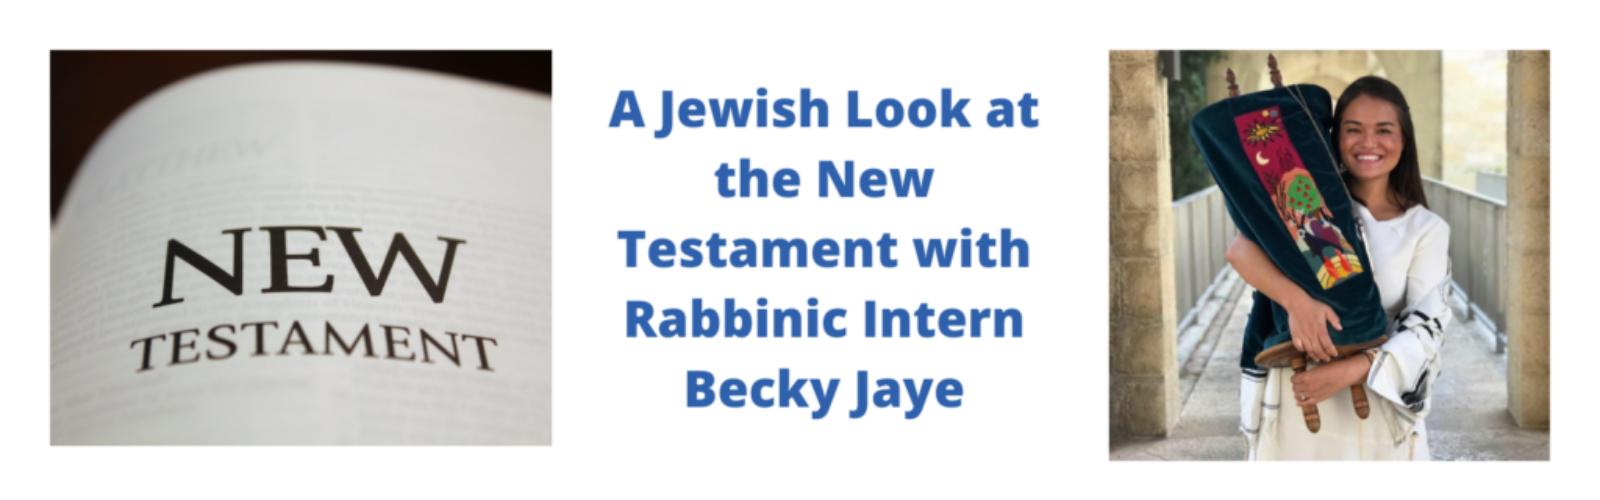 A Jewish Look at the New Testament